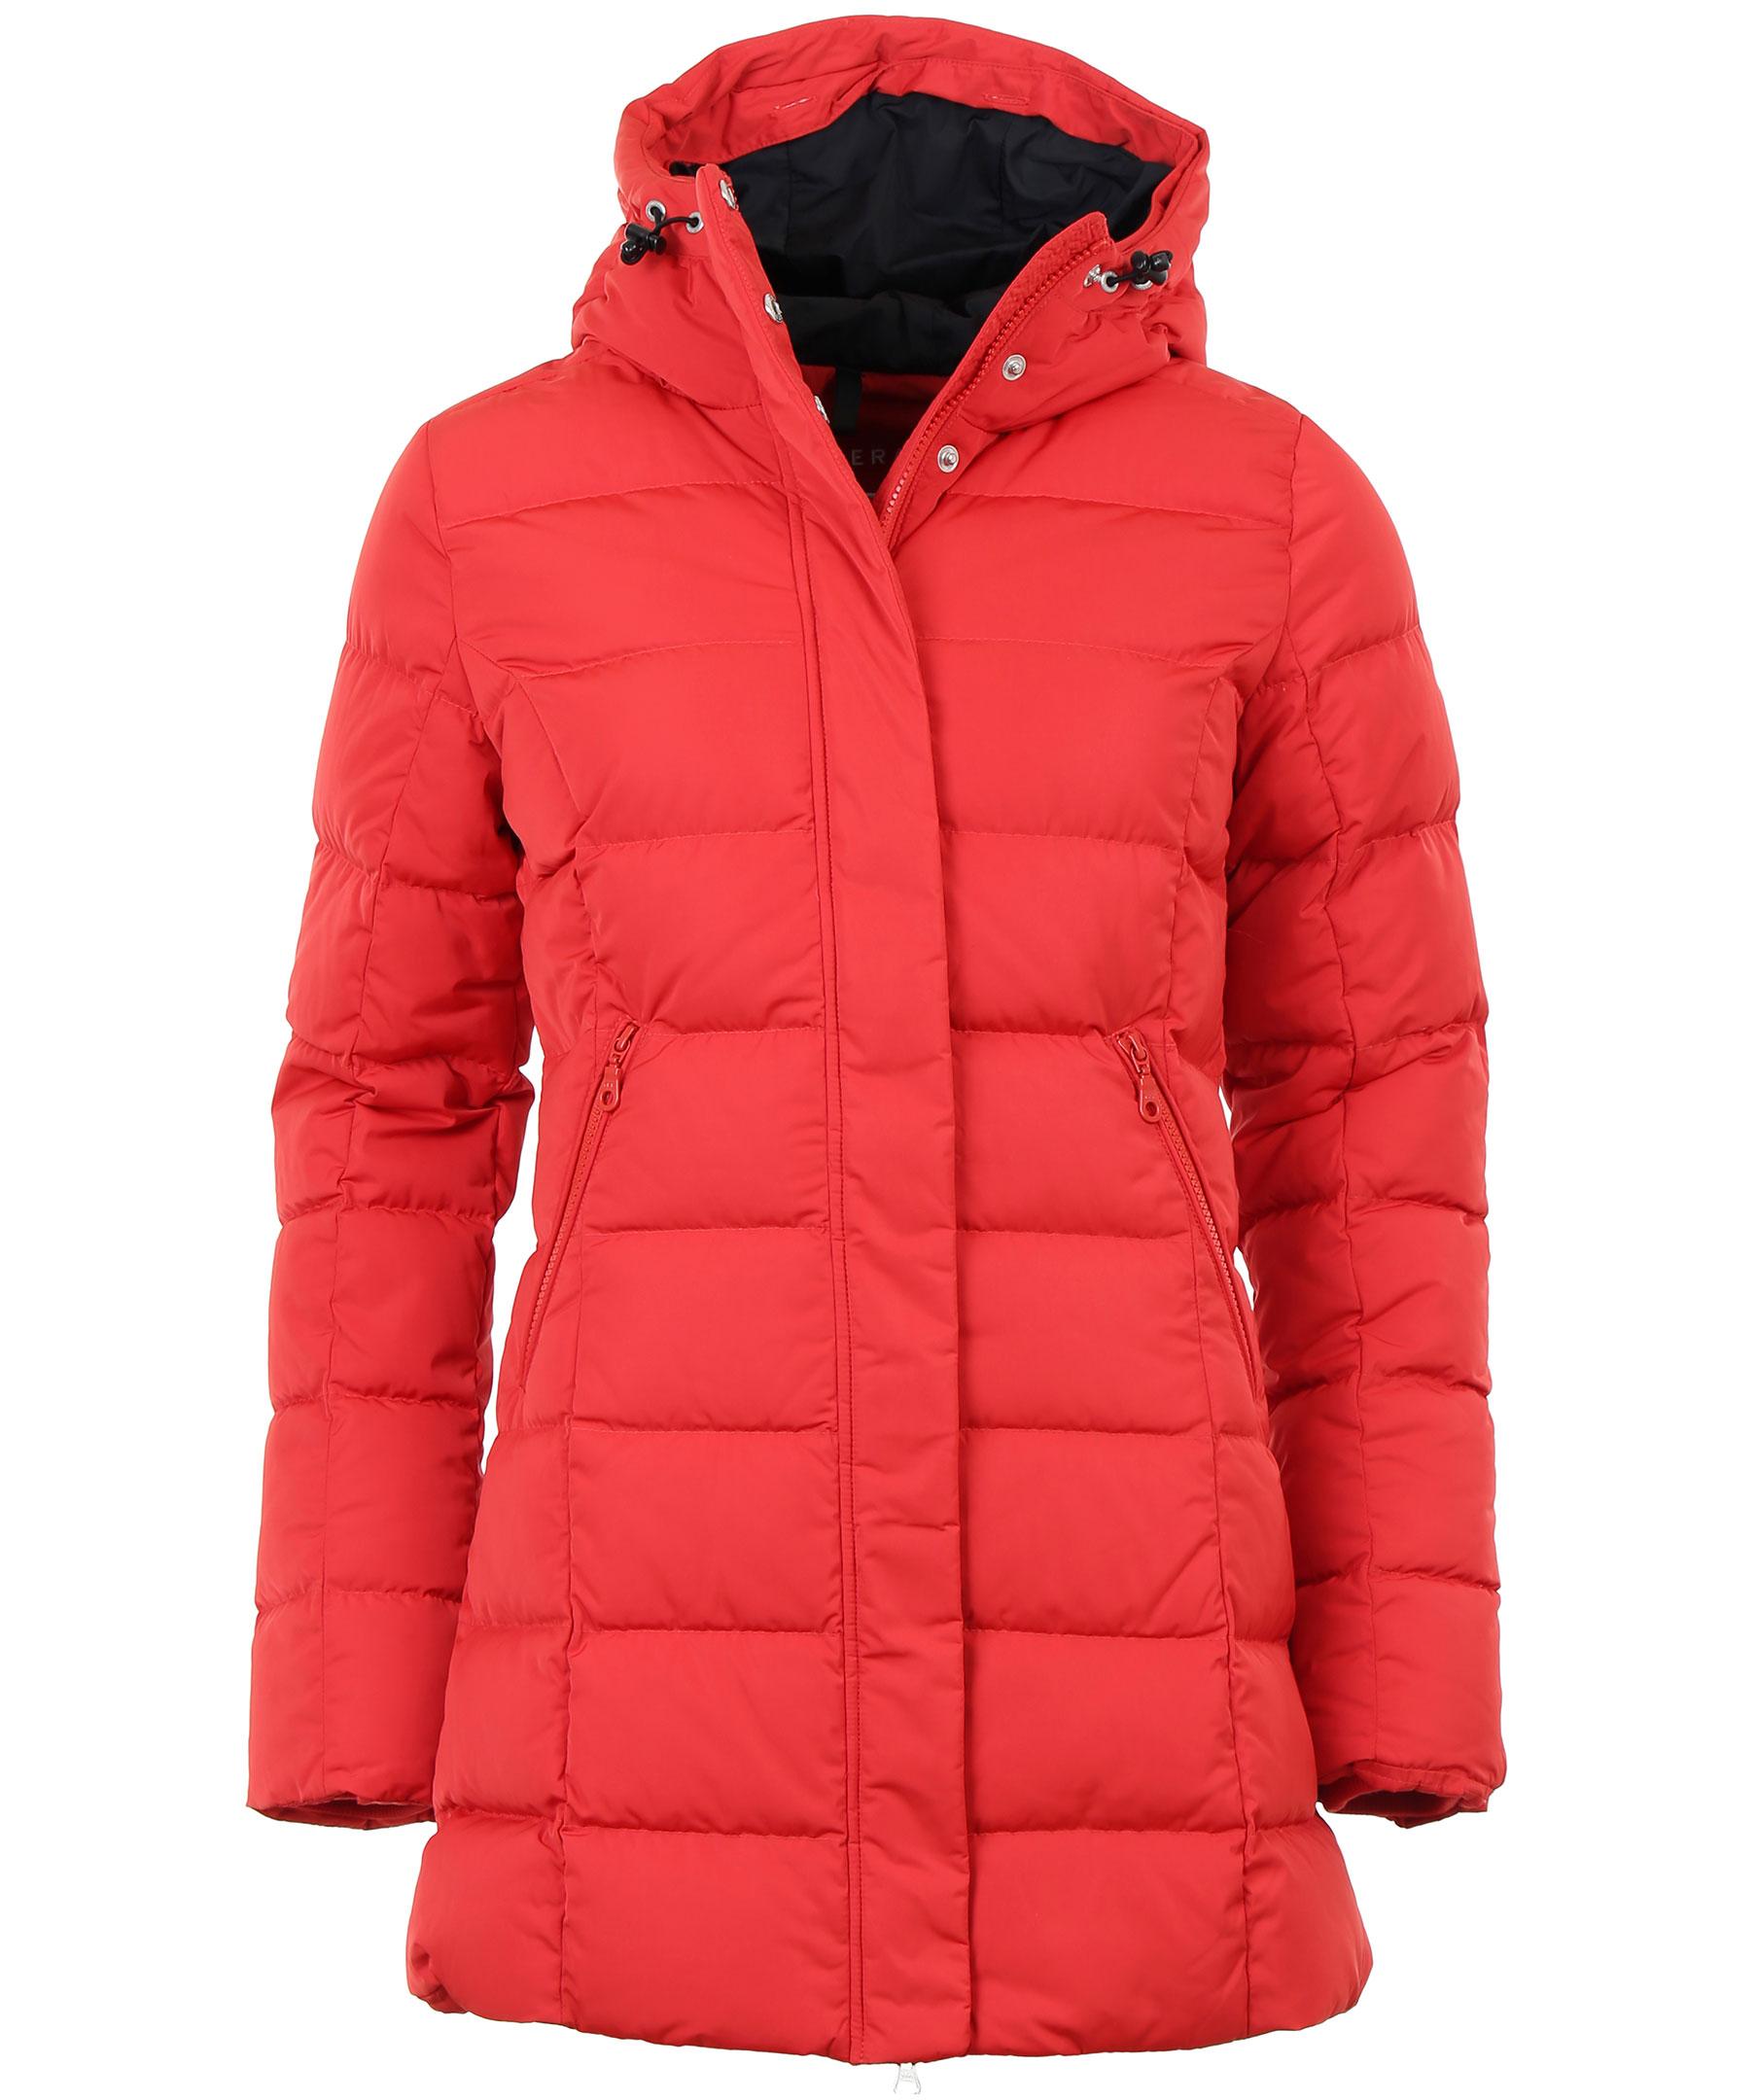 Siri Down Jacket, röd